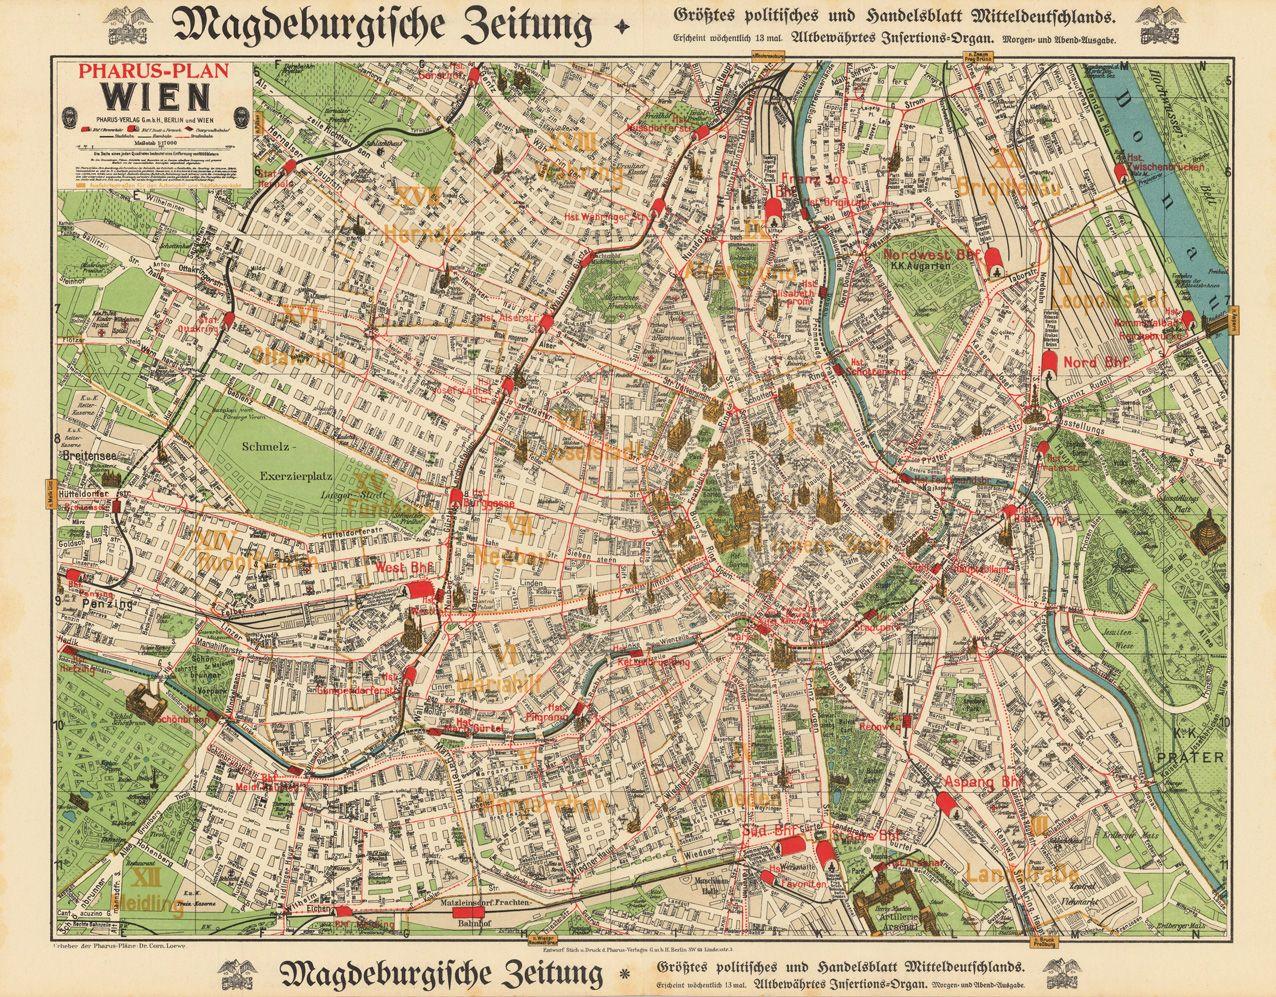 Pharus verlag 1910 vienna austria maps of the world pinterest pharus verlag 1910 vienna austria gumiabroncs Gallery